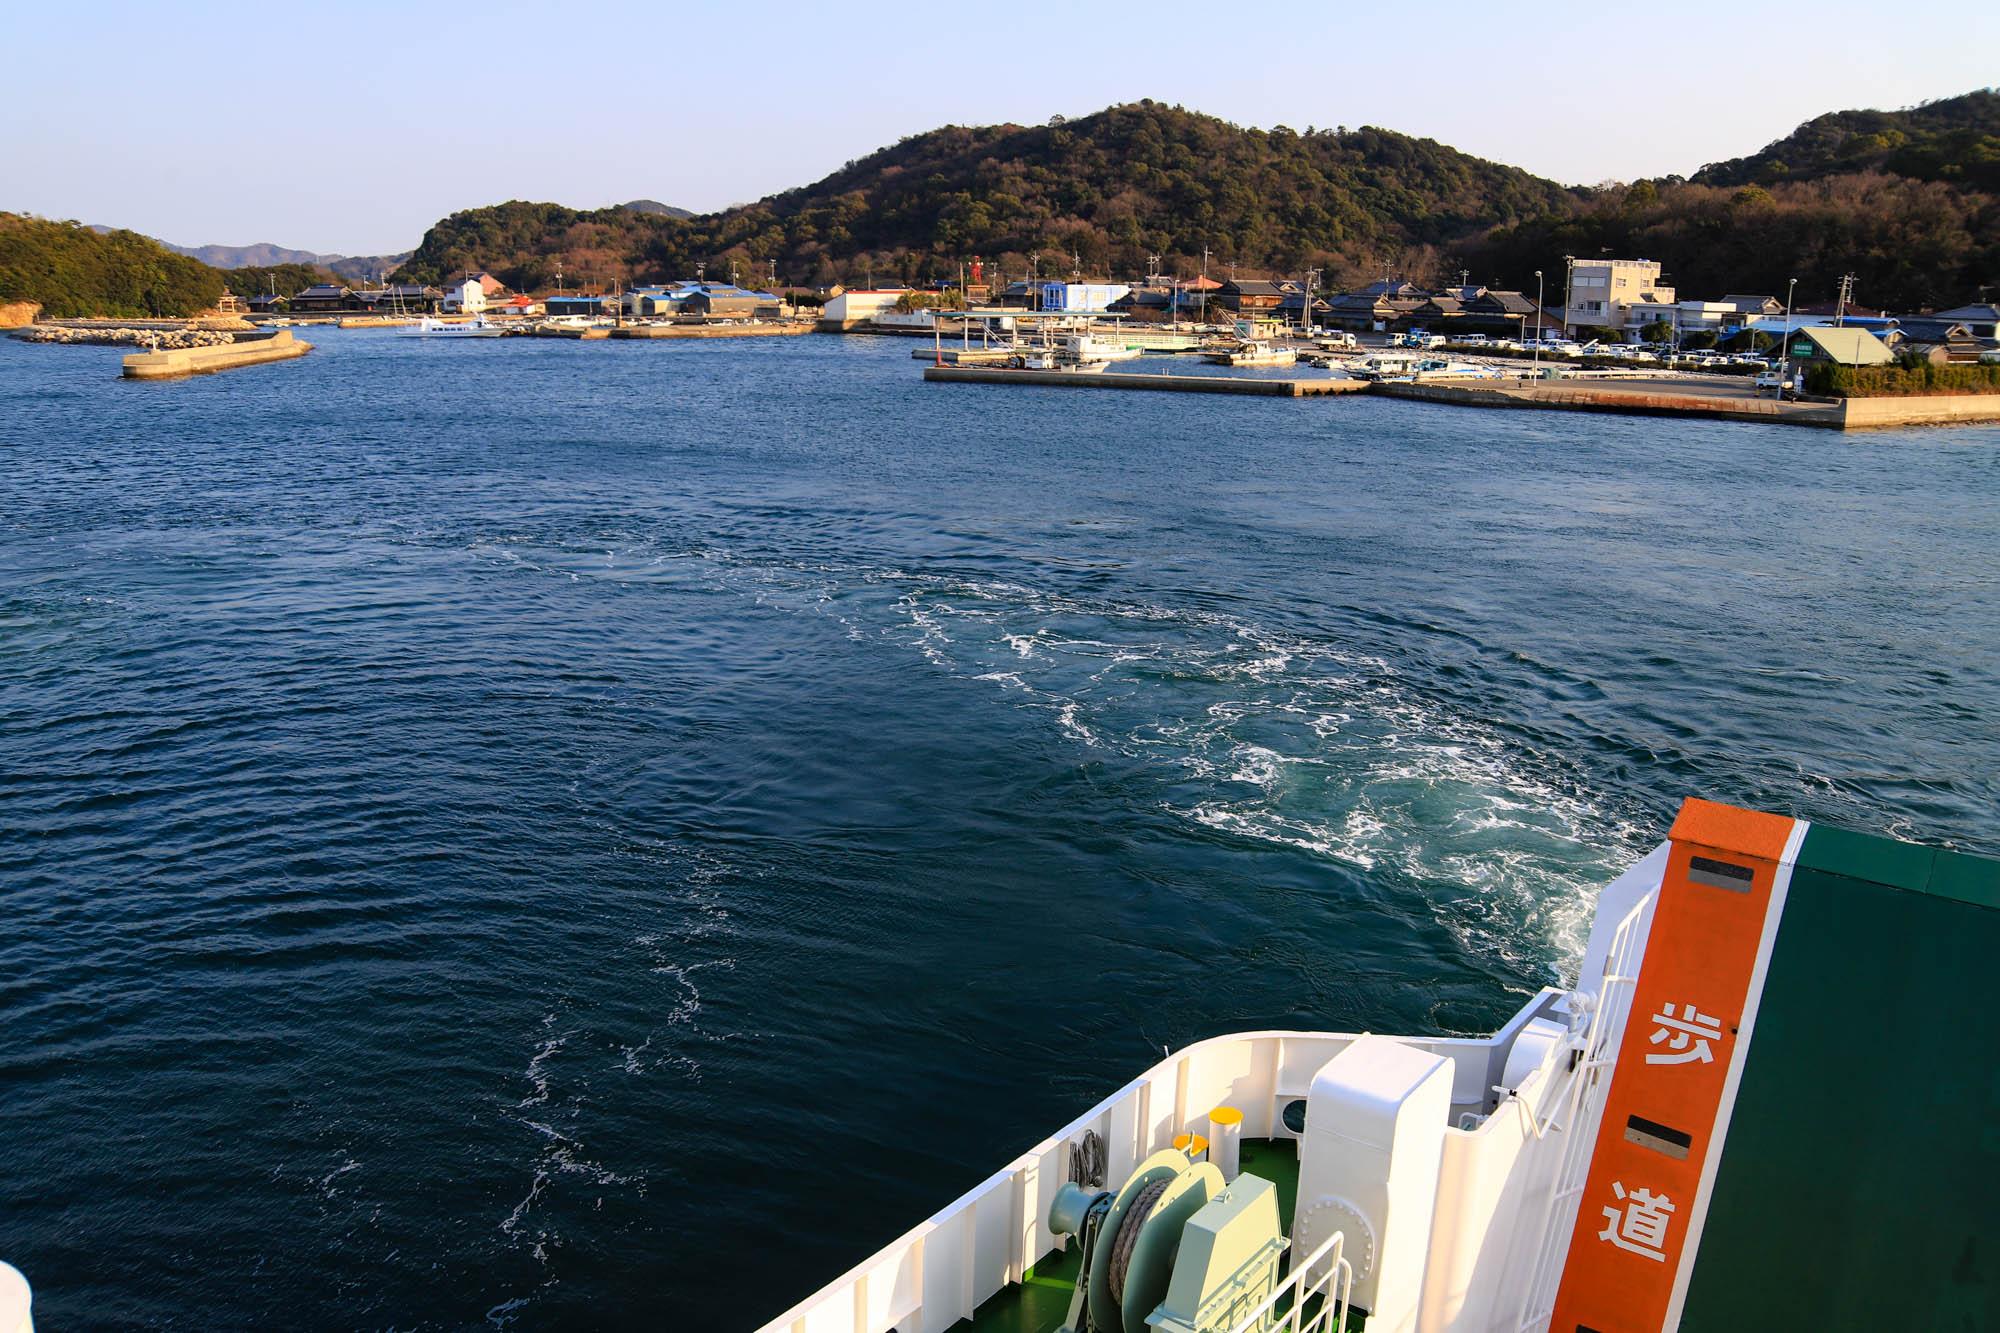 takagisan_ferry-2.jpg